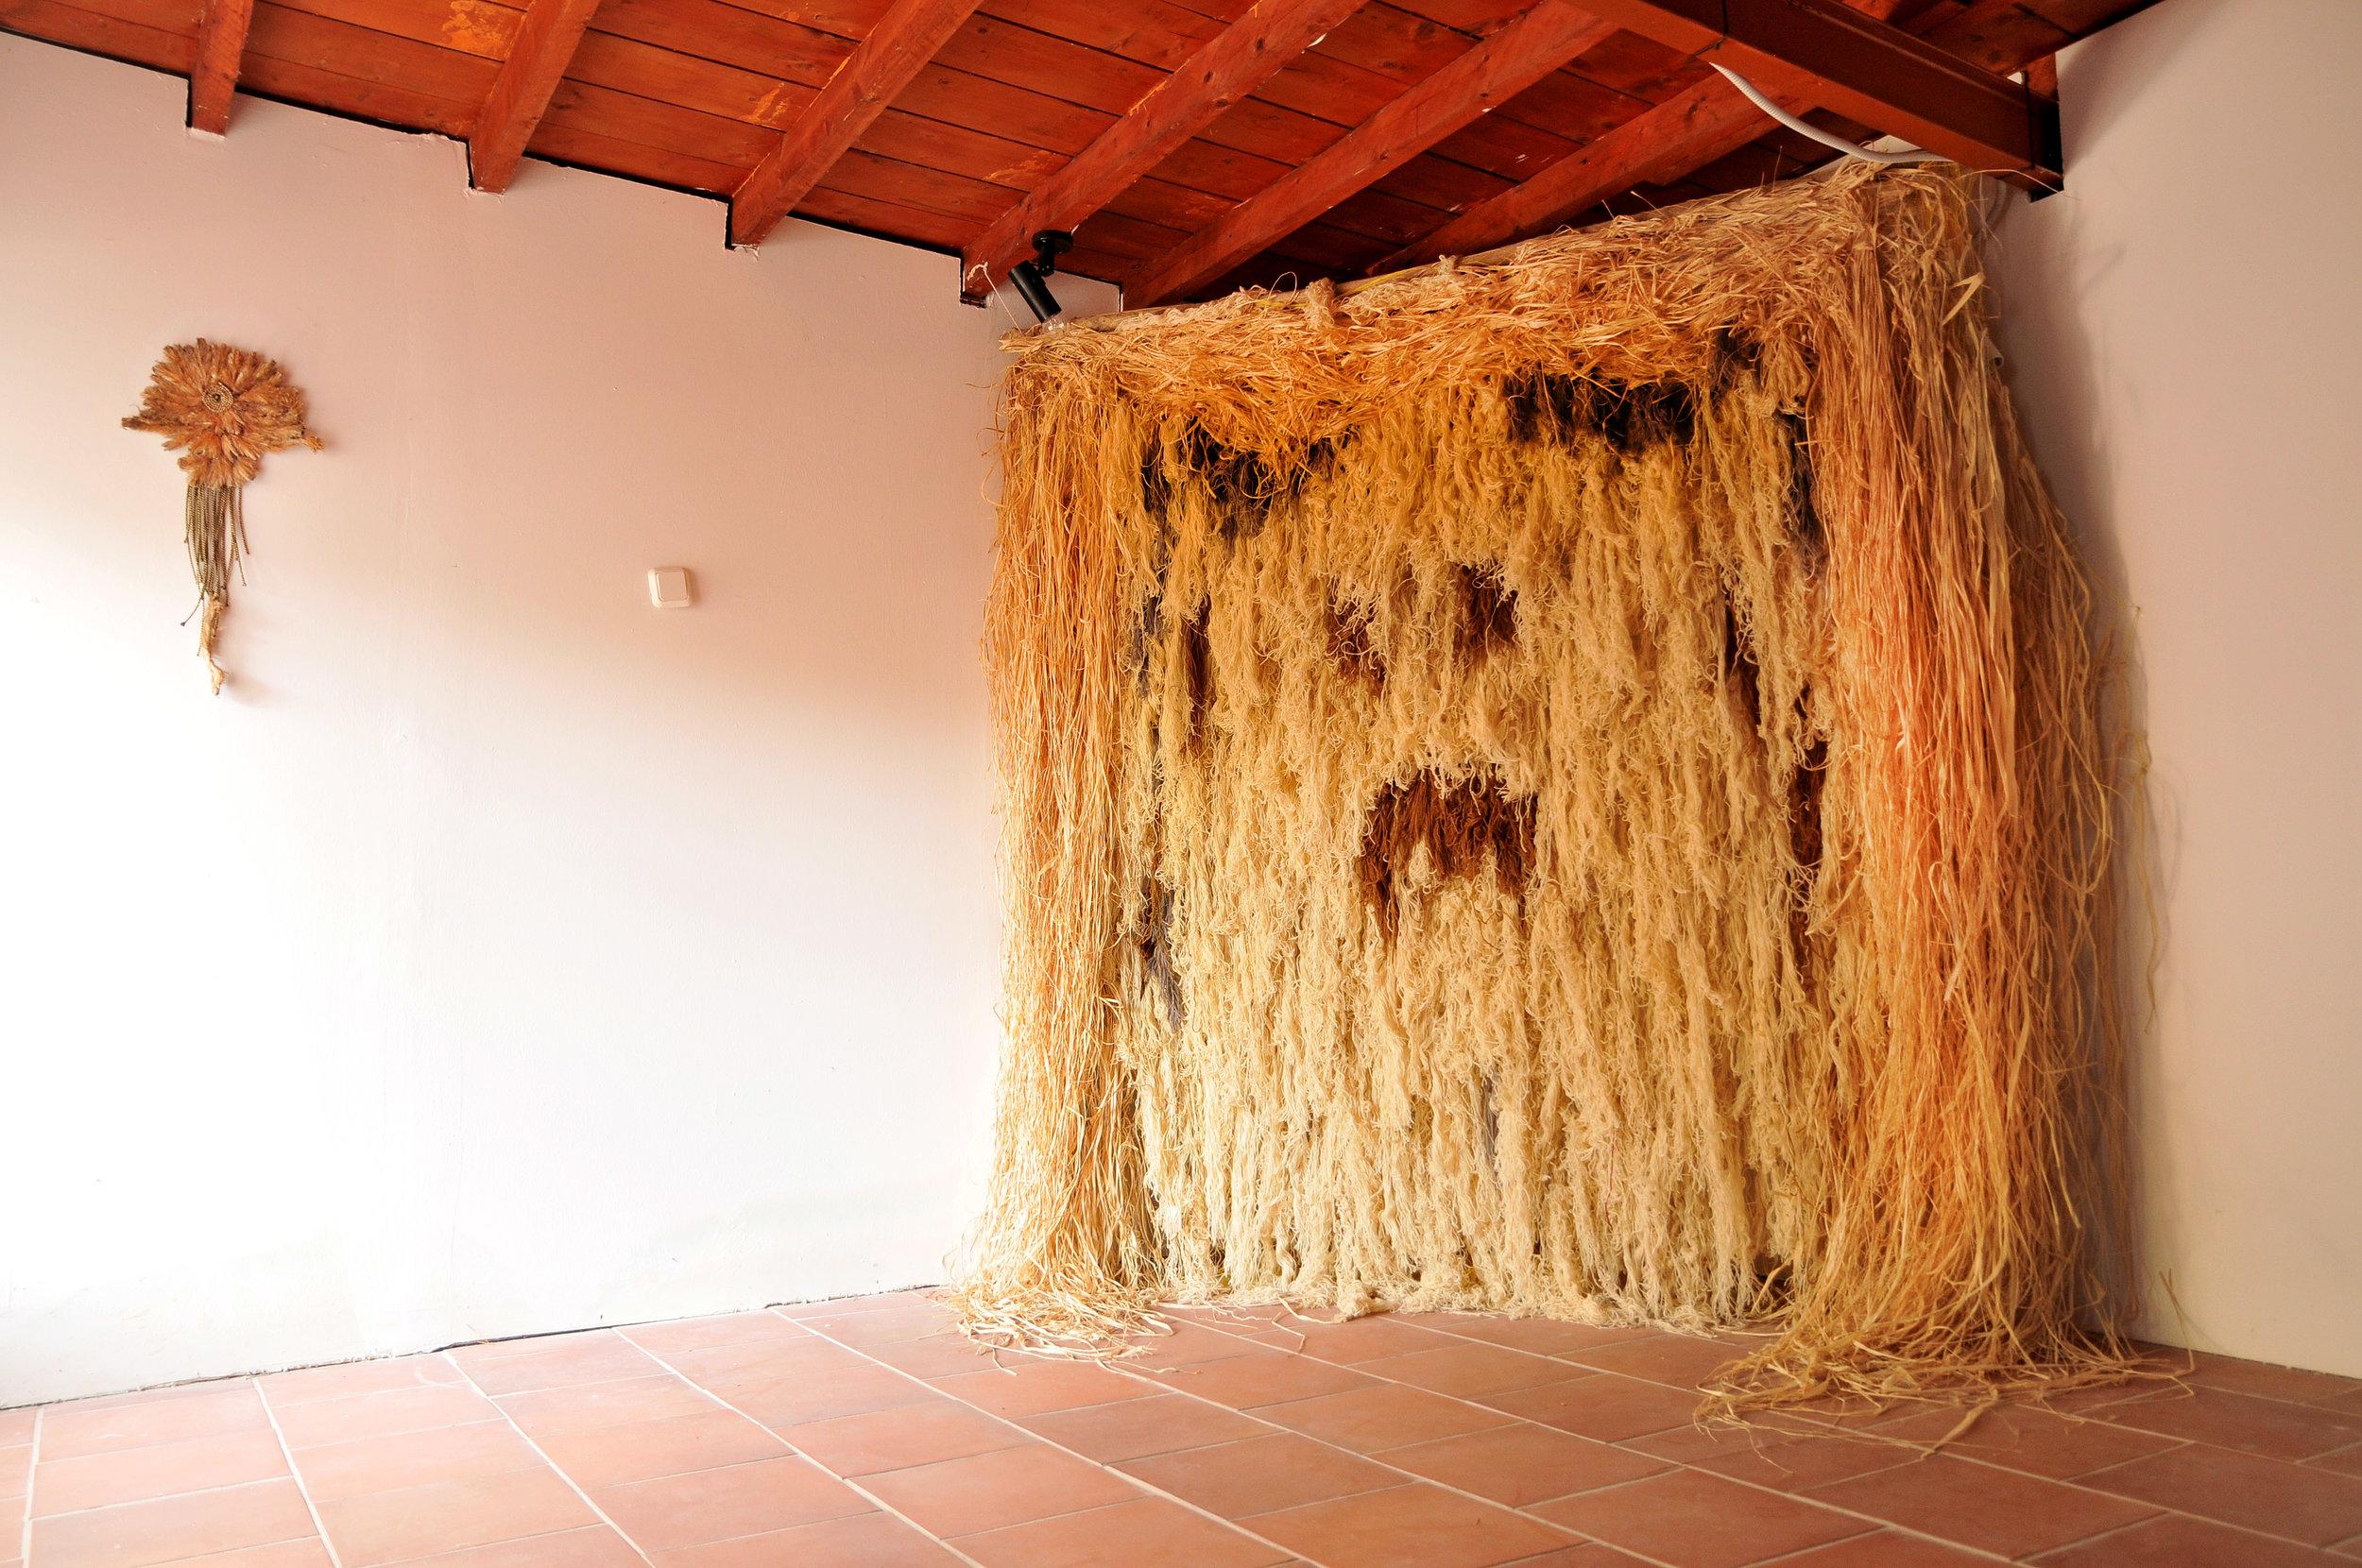 Marina Velisioti, Primitive Dance, Ιnstallation, Folklore Museum, Chora, Samothrace, 2019